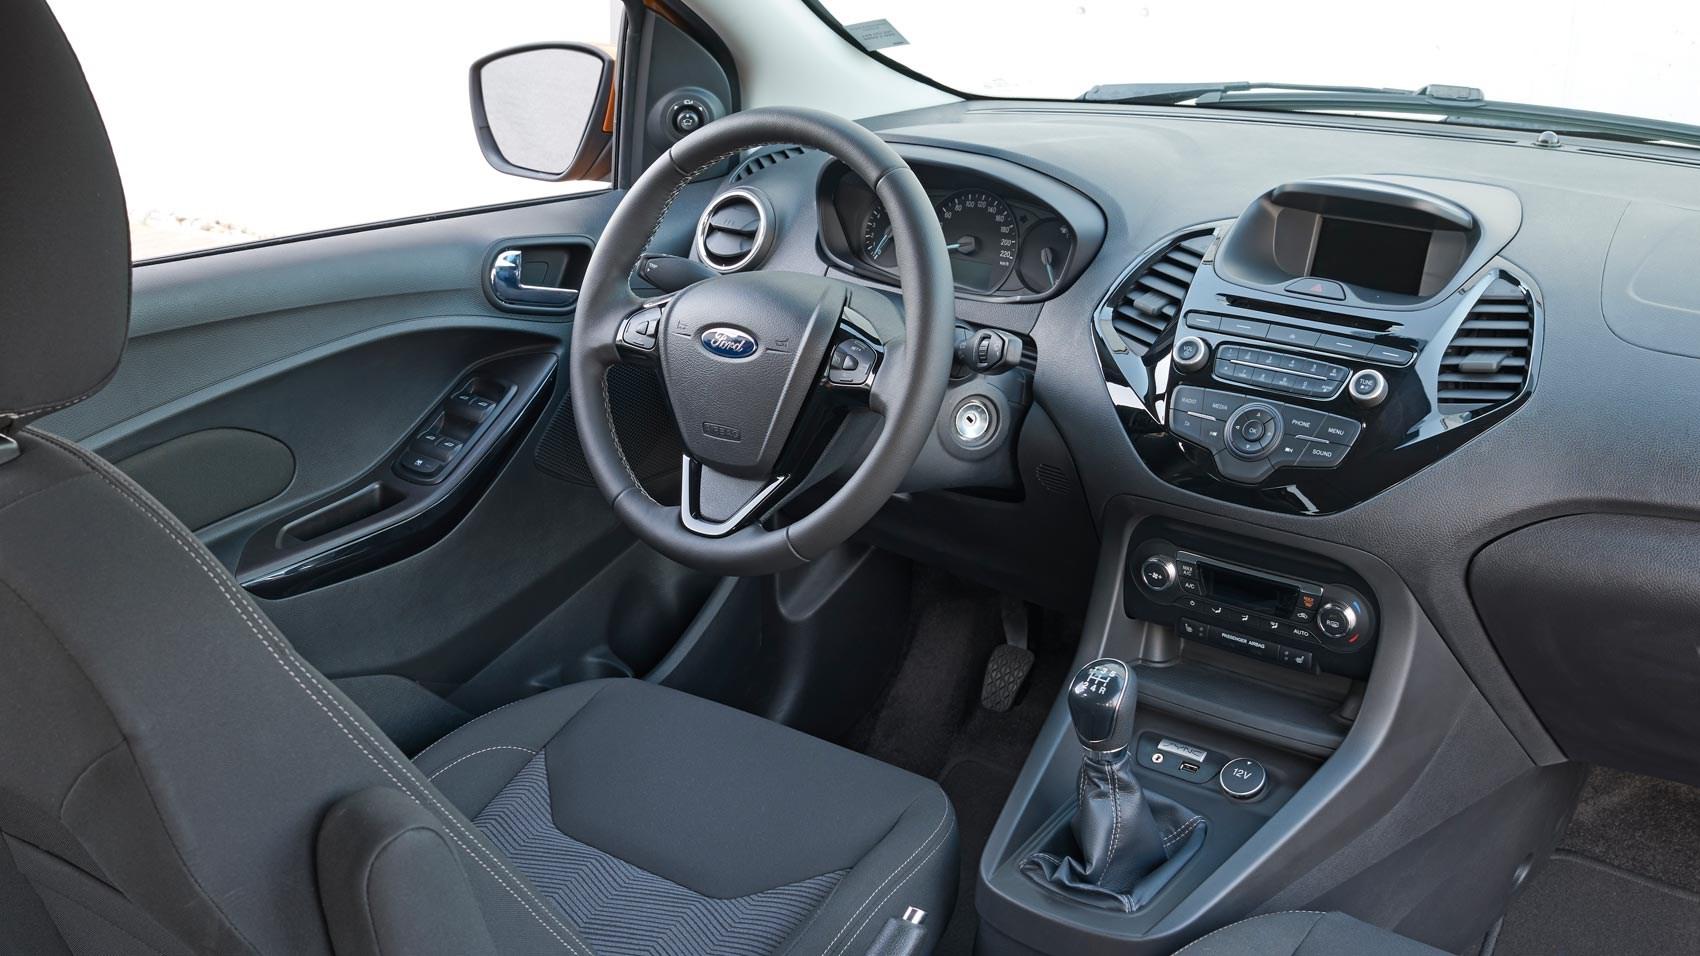 Ford Ka 1 2 85ps Zetec 2016 Review Car Magazine